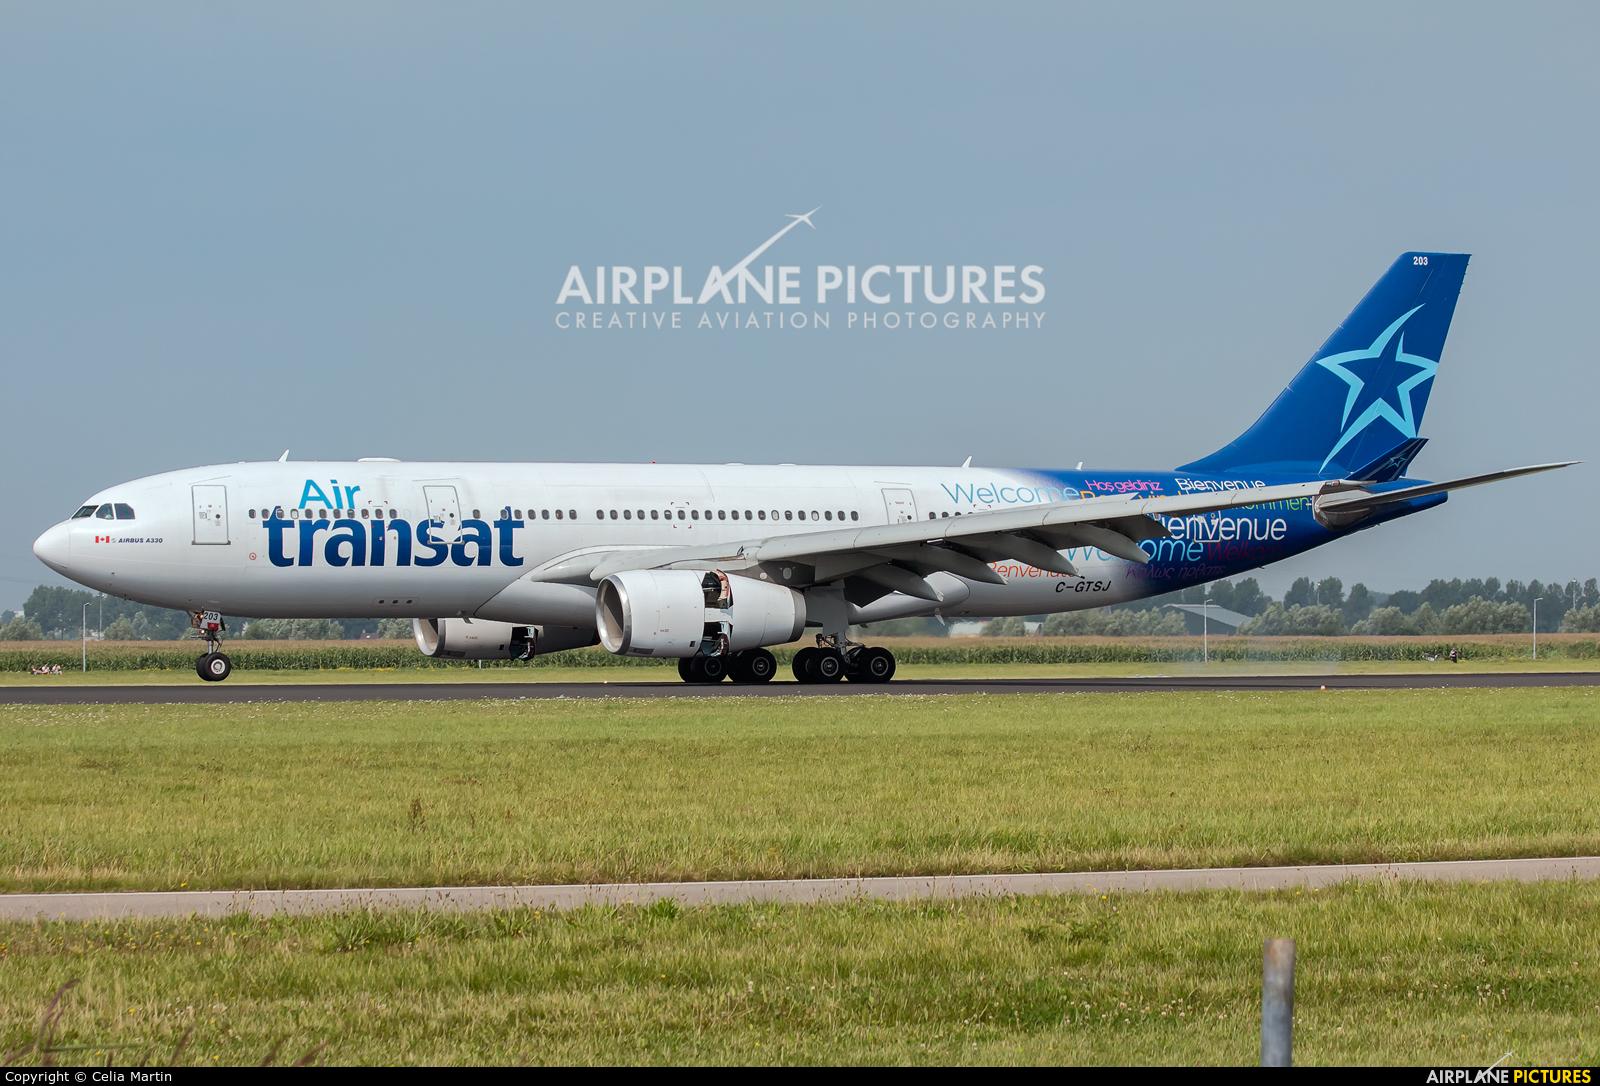 Air Transat C-GTSJ aircraft at Amsterdam - Schiphol